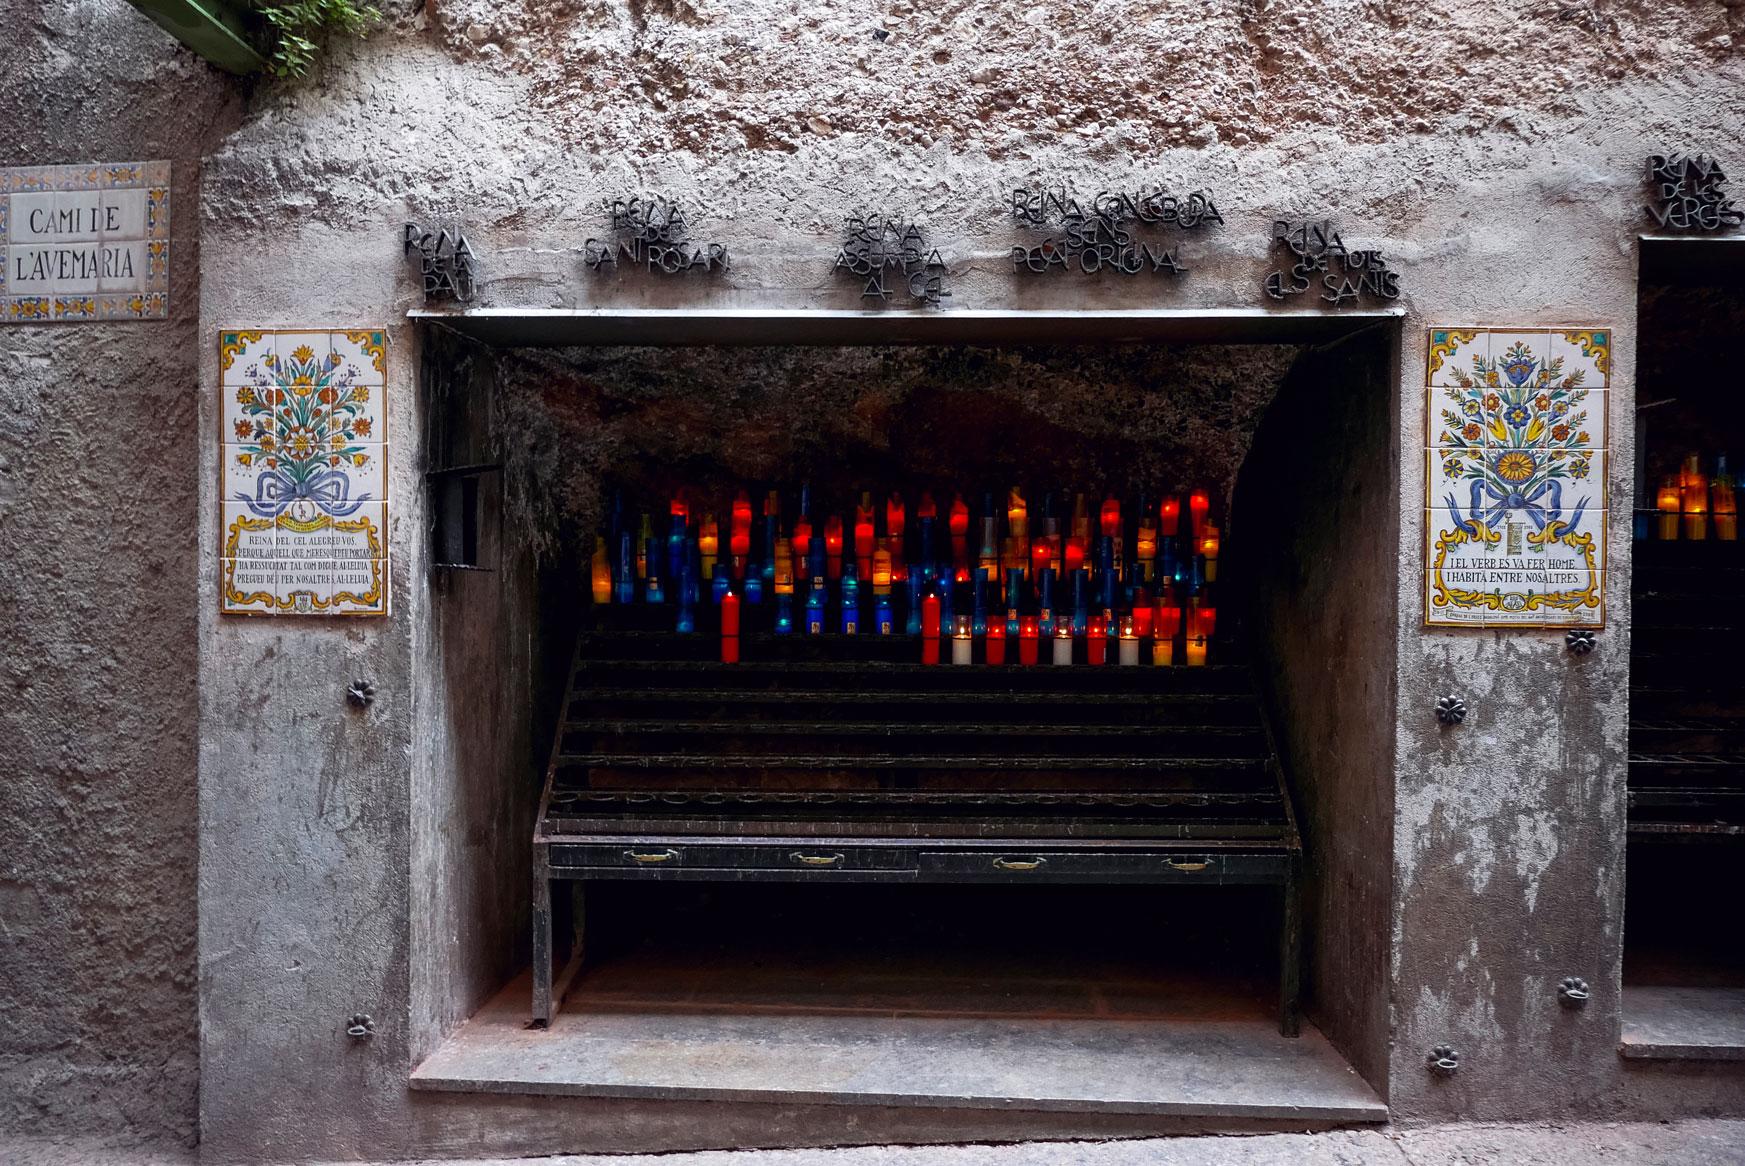 Spain Barcelona Montserrat Monastery Santa Maria candle path5